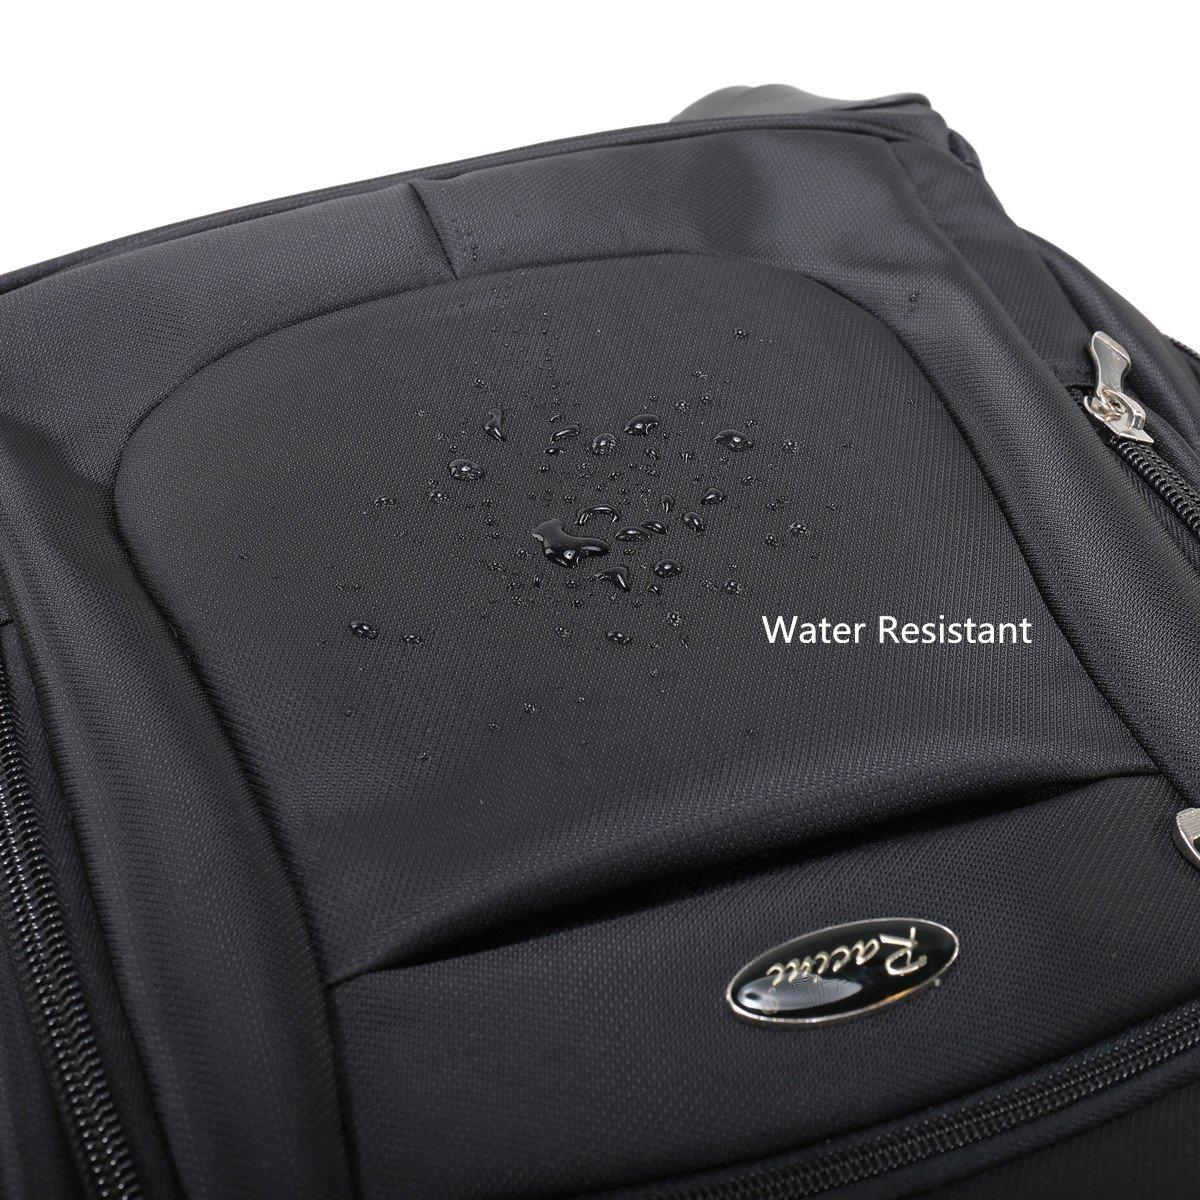 Racini Nylon Waterproof Rolling Backpack, Freewheel Travel School Wheeled Backpack, Carry-on Luggage with Anti-theft Zippers (Black) by Racini (Image #6)